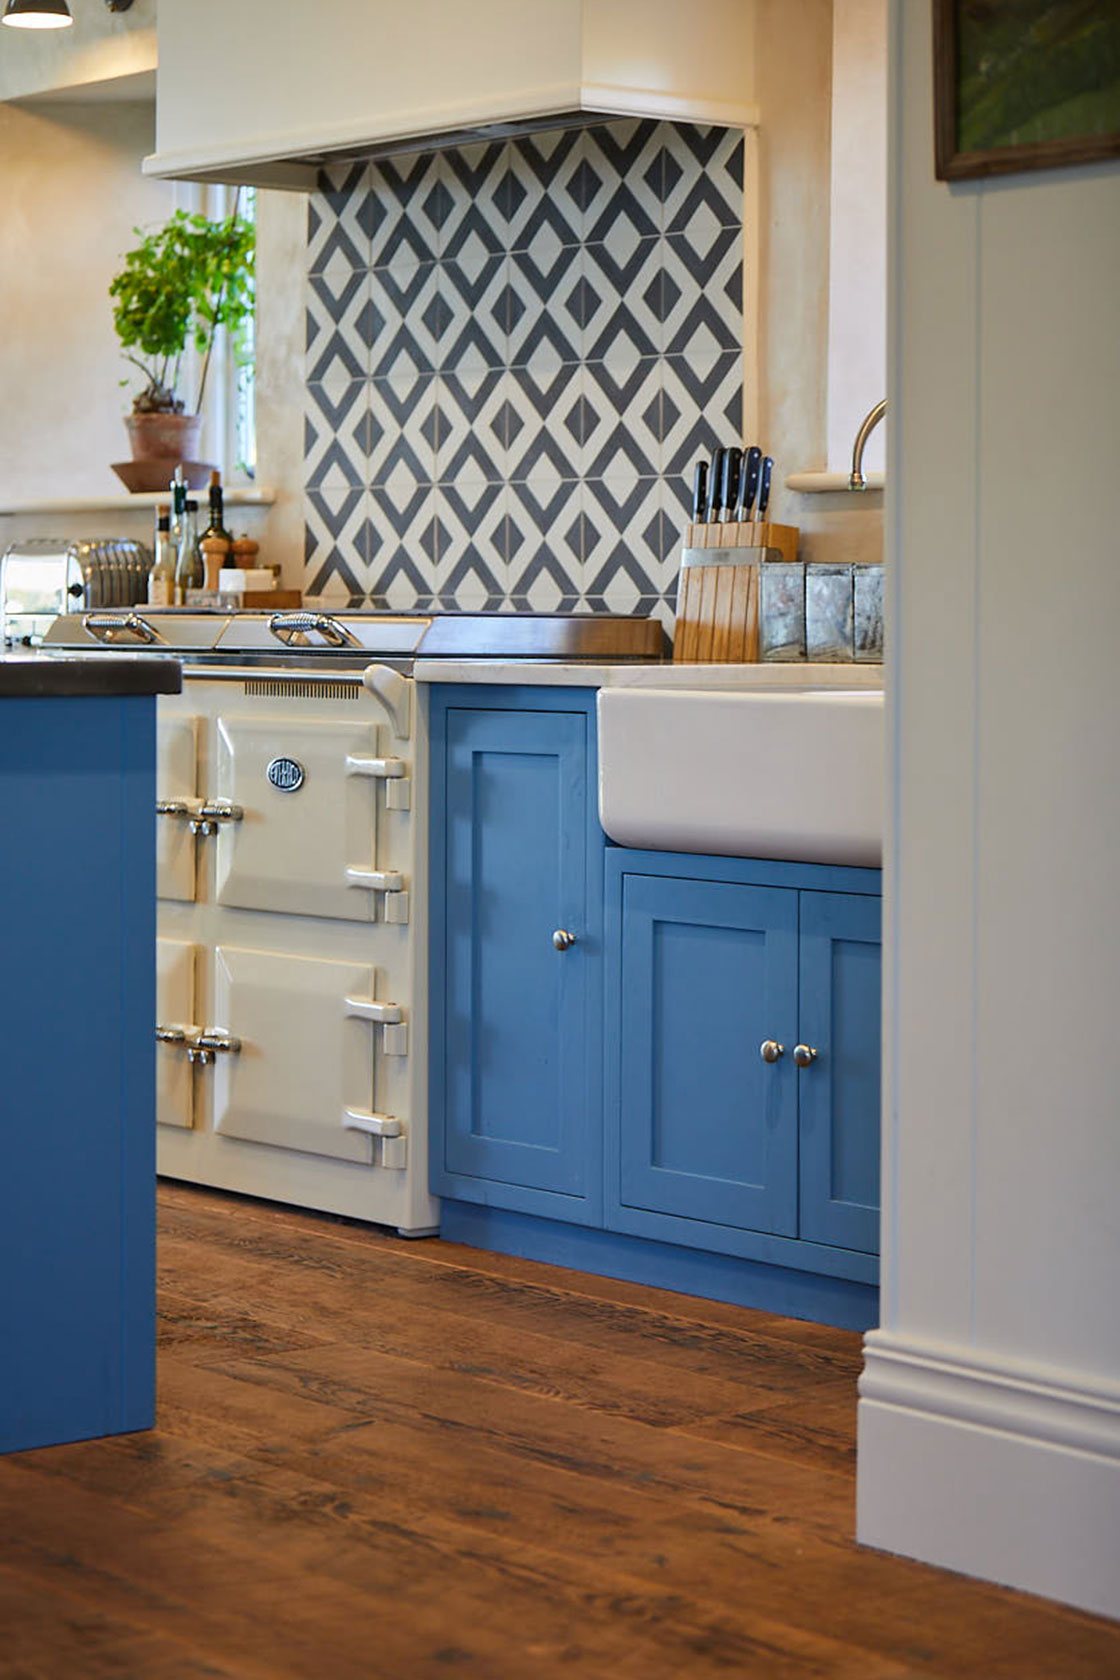 Geometric tiles behind cream Everhot cooker